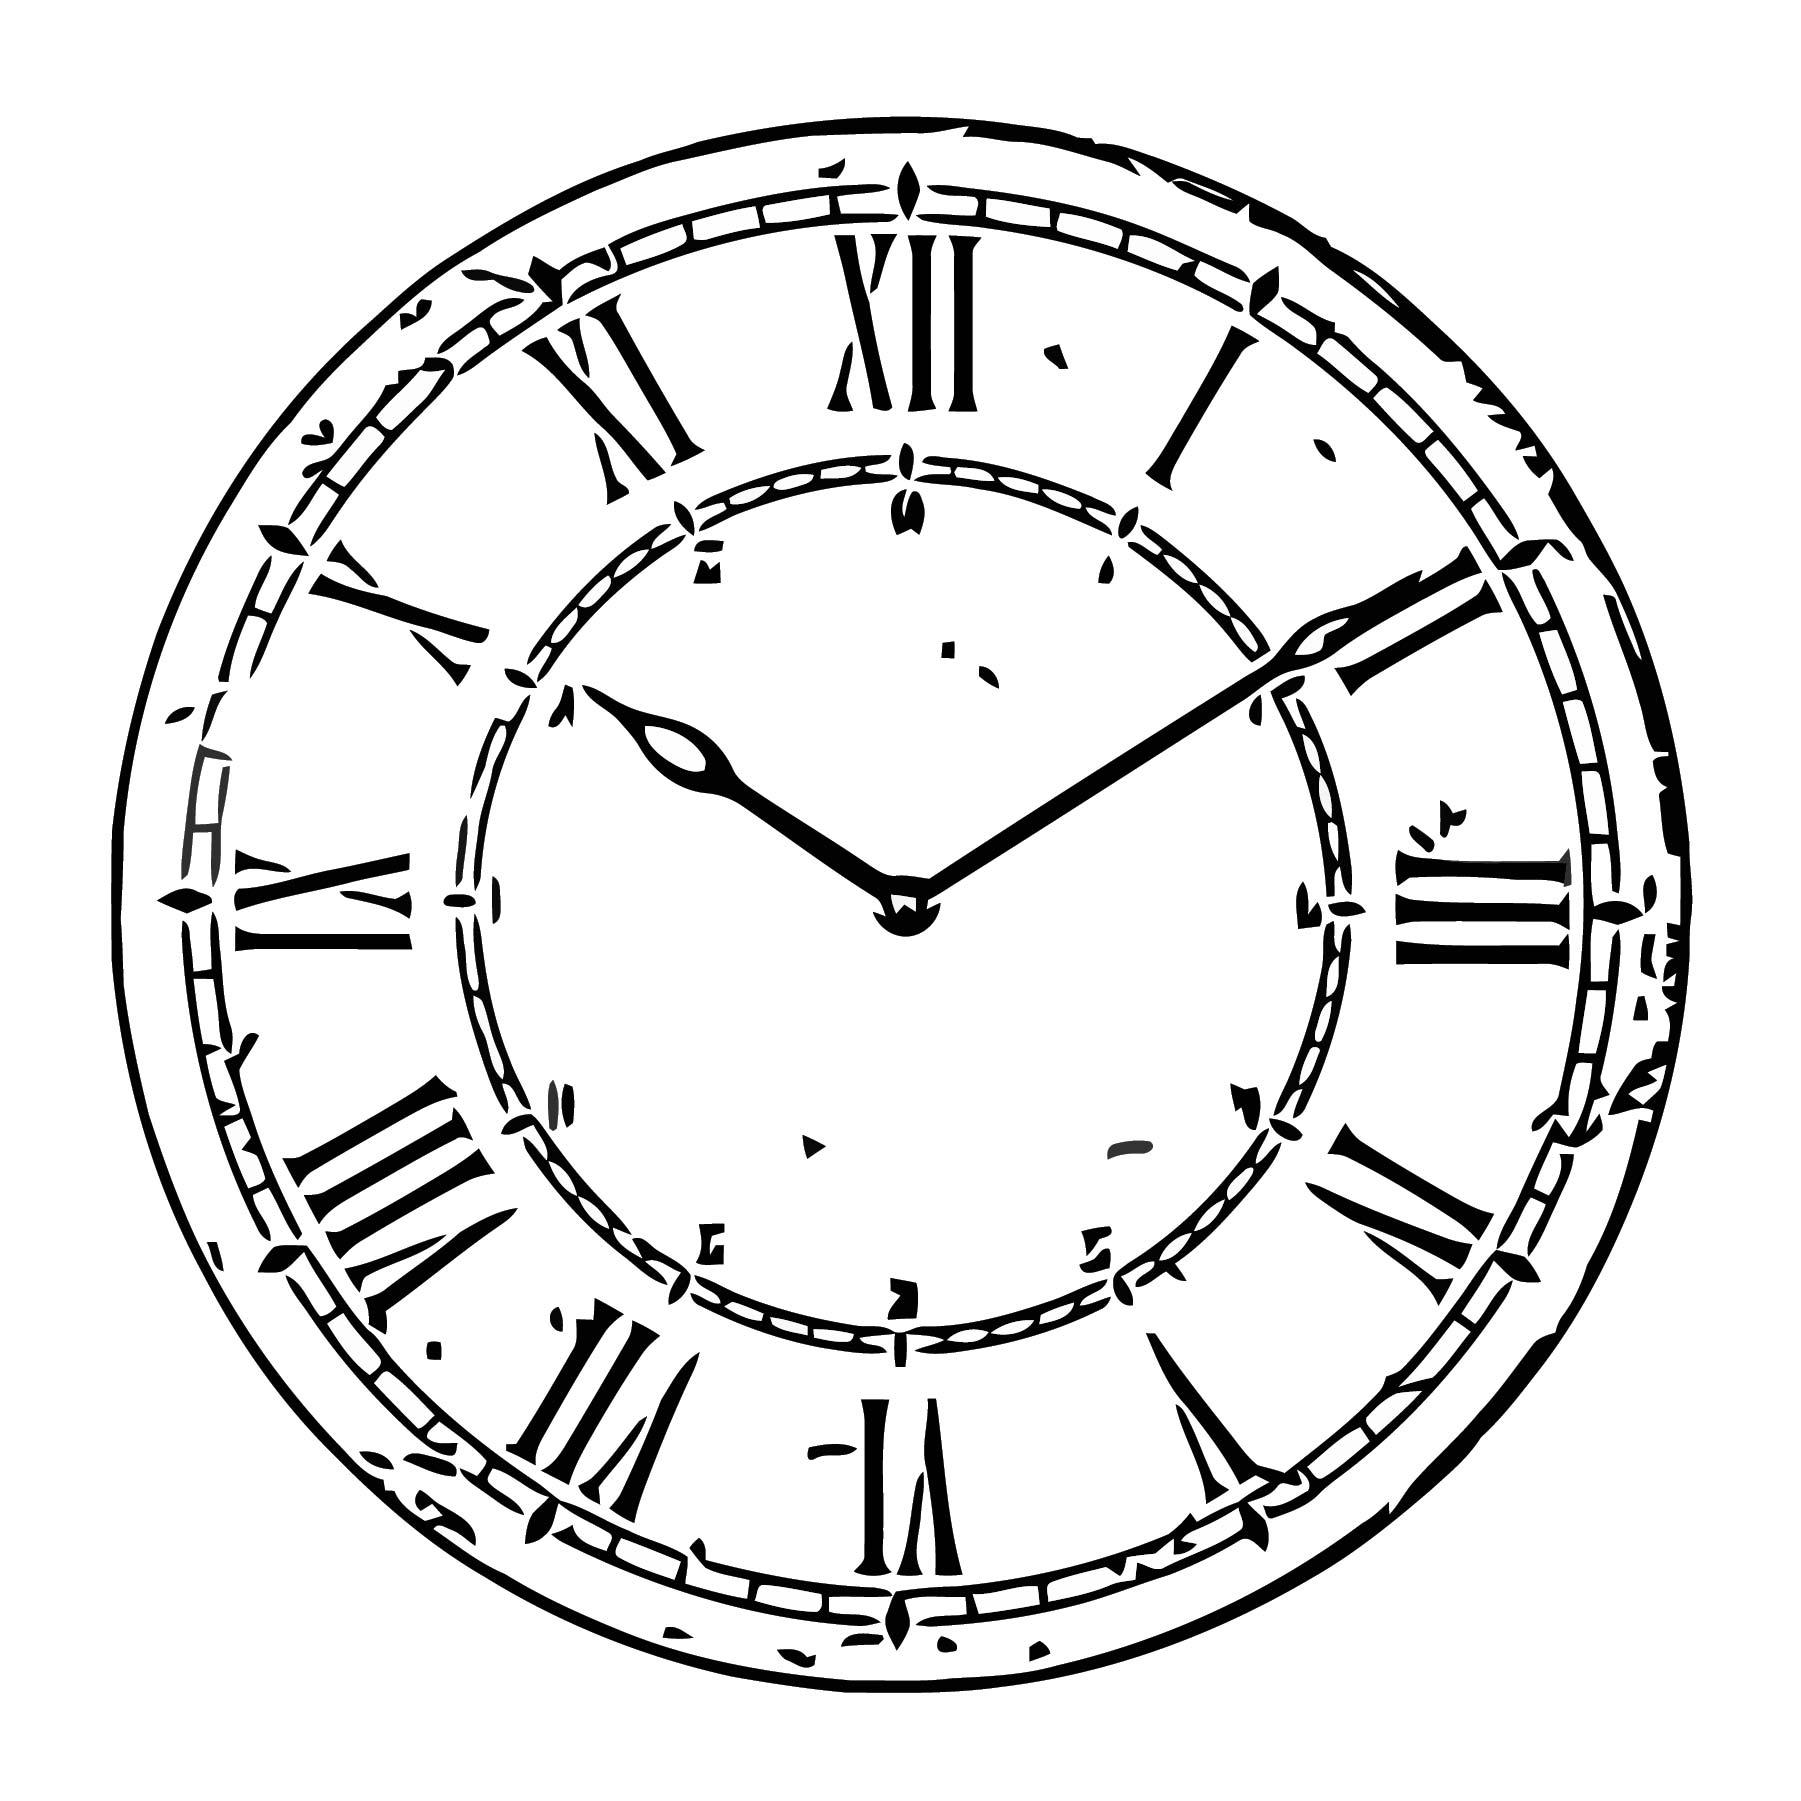 Bitnik Wall Clock White 0406311 Pe569289 Free Printable S4 Cartoonized Free Printable Coloring Page